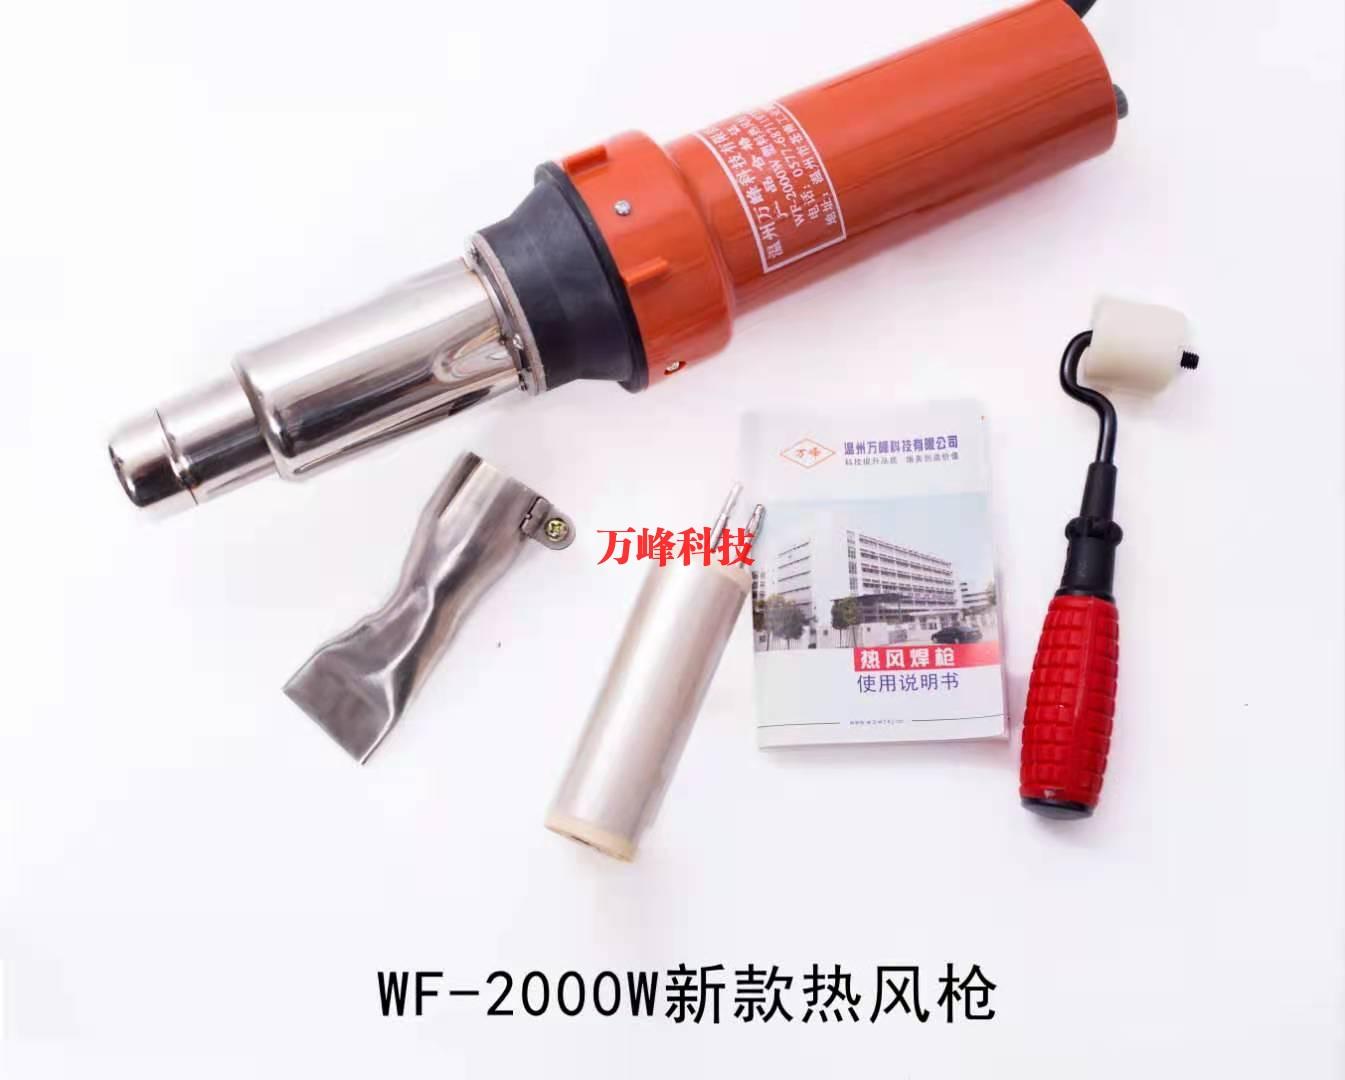 WF-200W新款热风枪